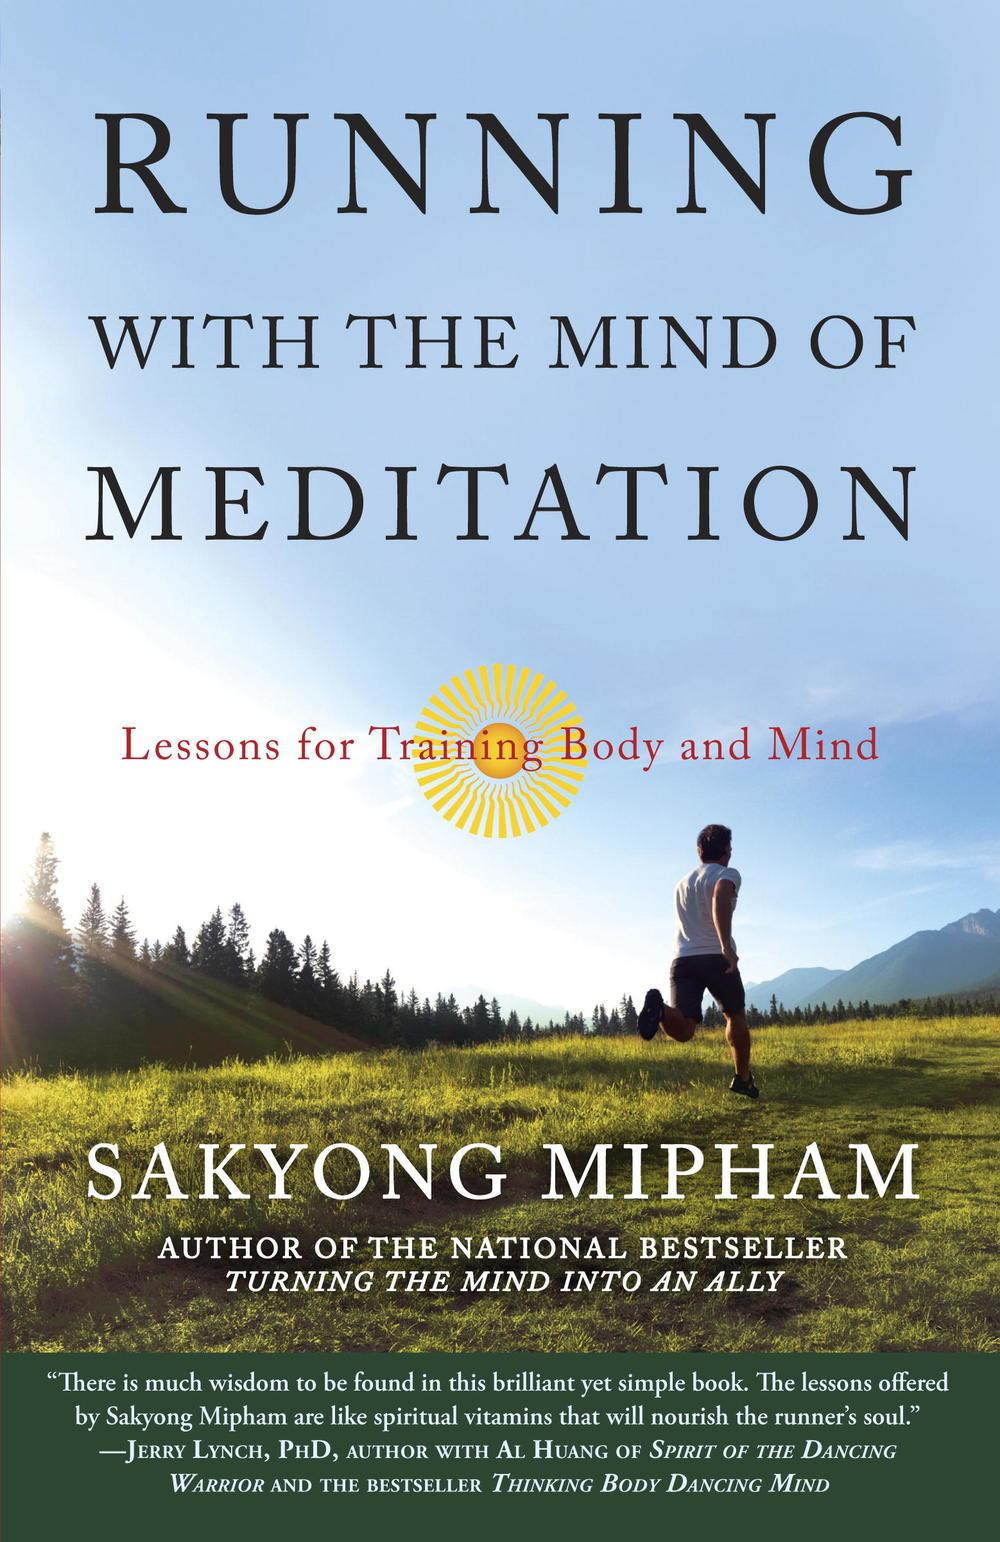 Running with the Mind of Meditation - Sakyong Mipham